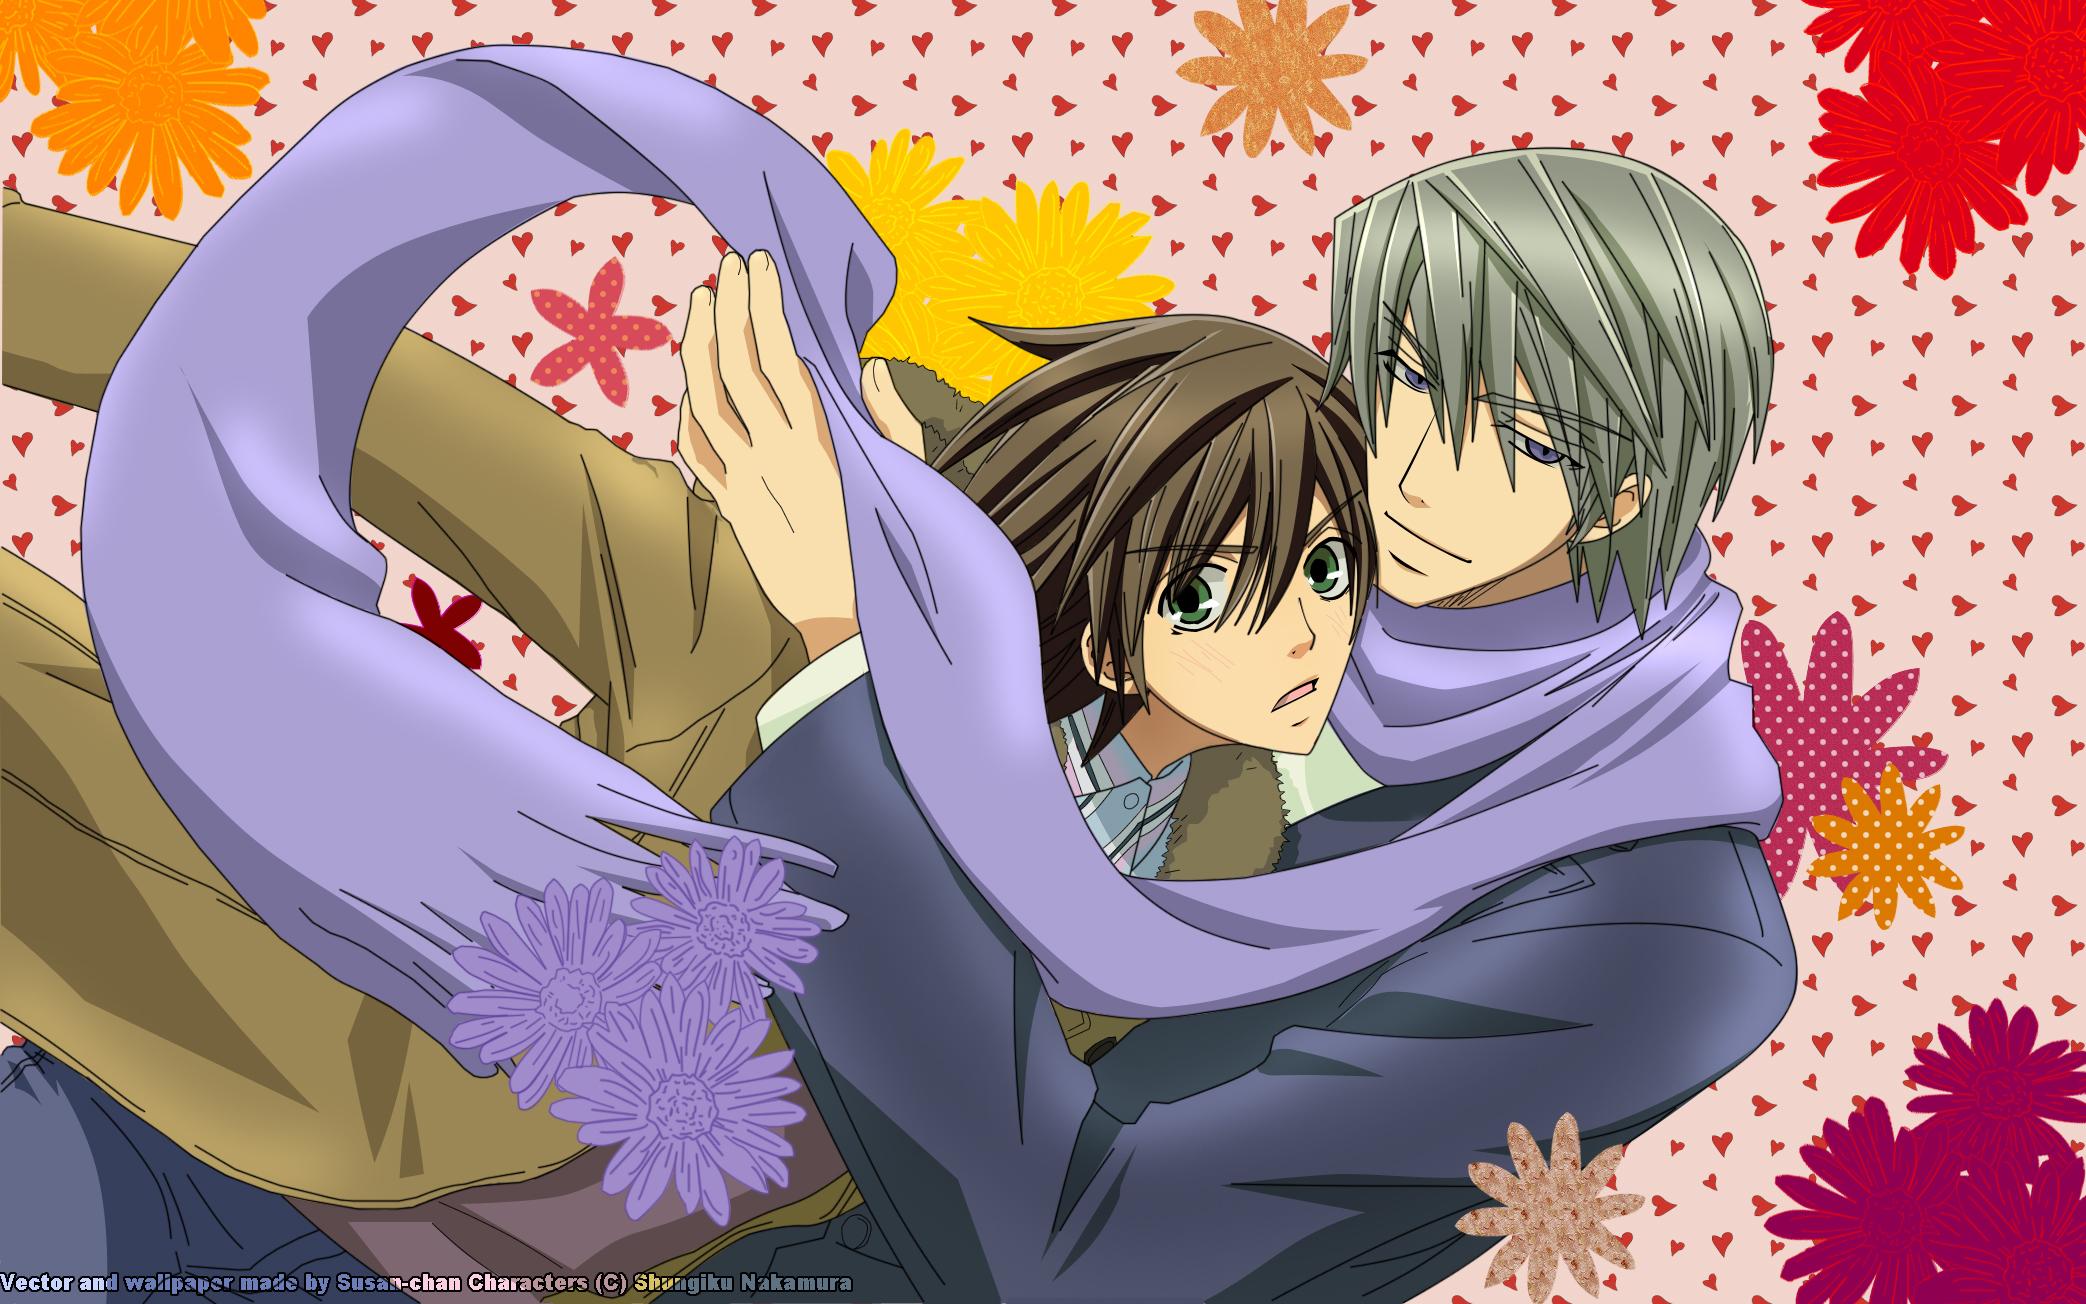 Usami Akihiko and Takakhashi Misaki from Junjou Romantica